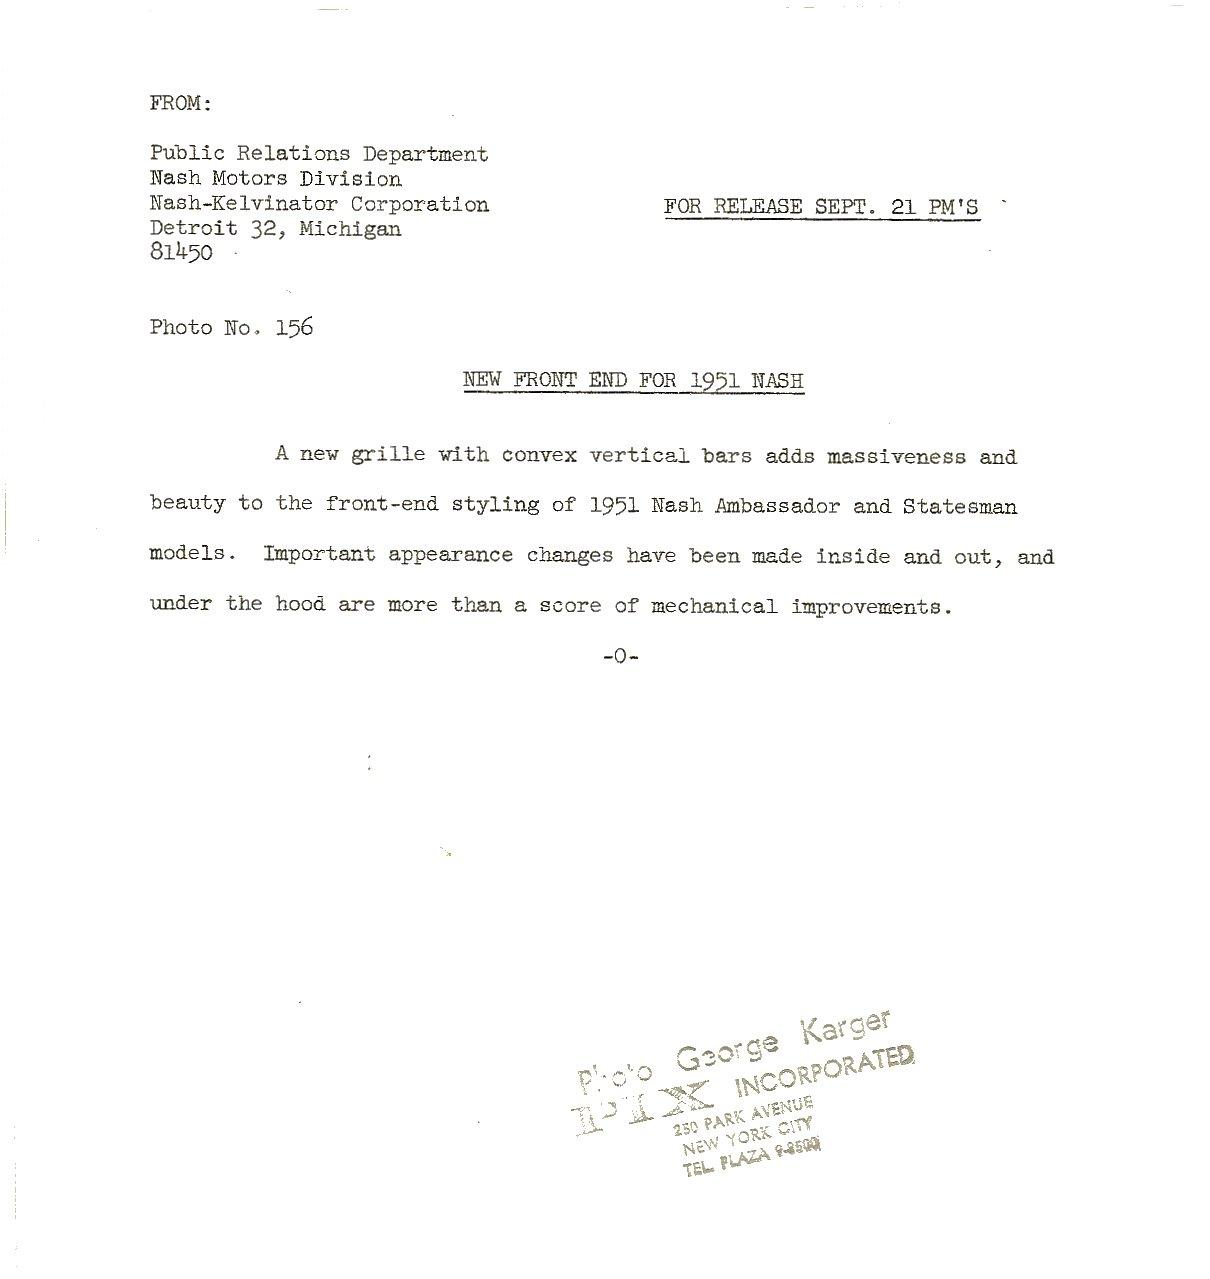 1951 NASH Press Release New Front End For 1951 NASH Ambassador and Statesman models Photo No. 156